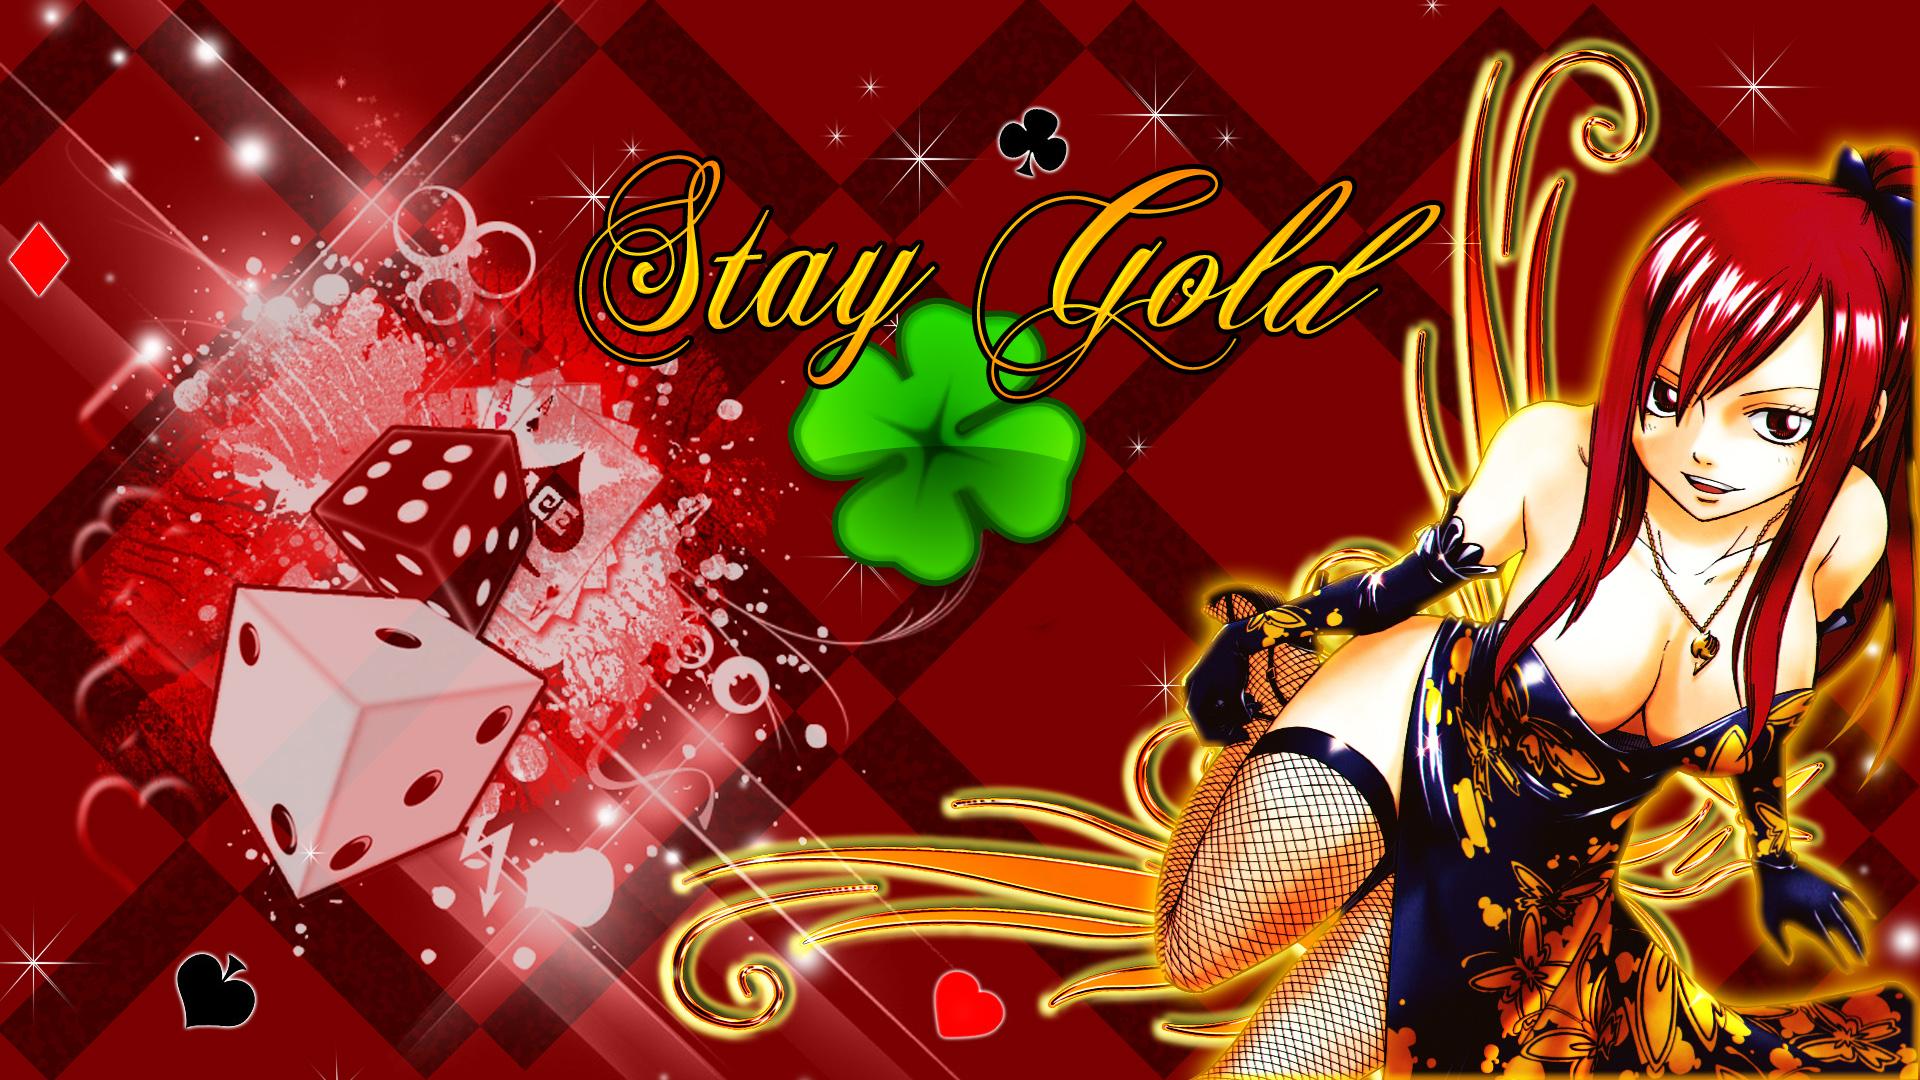 Fairy Tail wallpaper 4